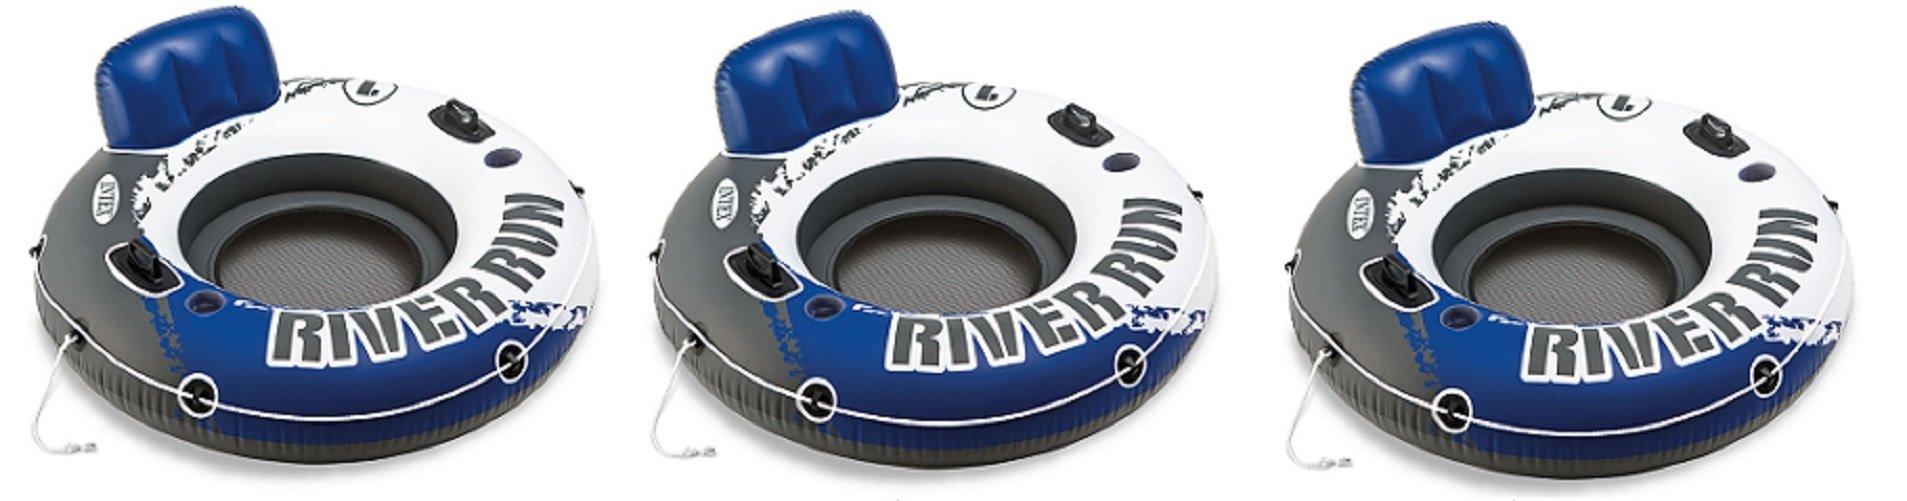 Intex River Run 1 Inflatable Floating Tube Raft for Lake, River, & Pool (3 Pack)